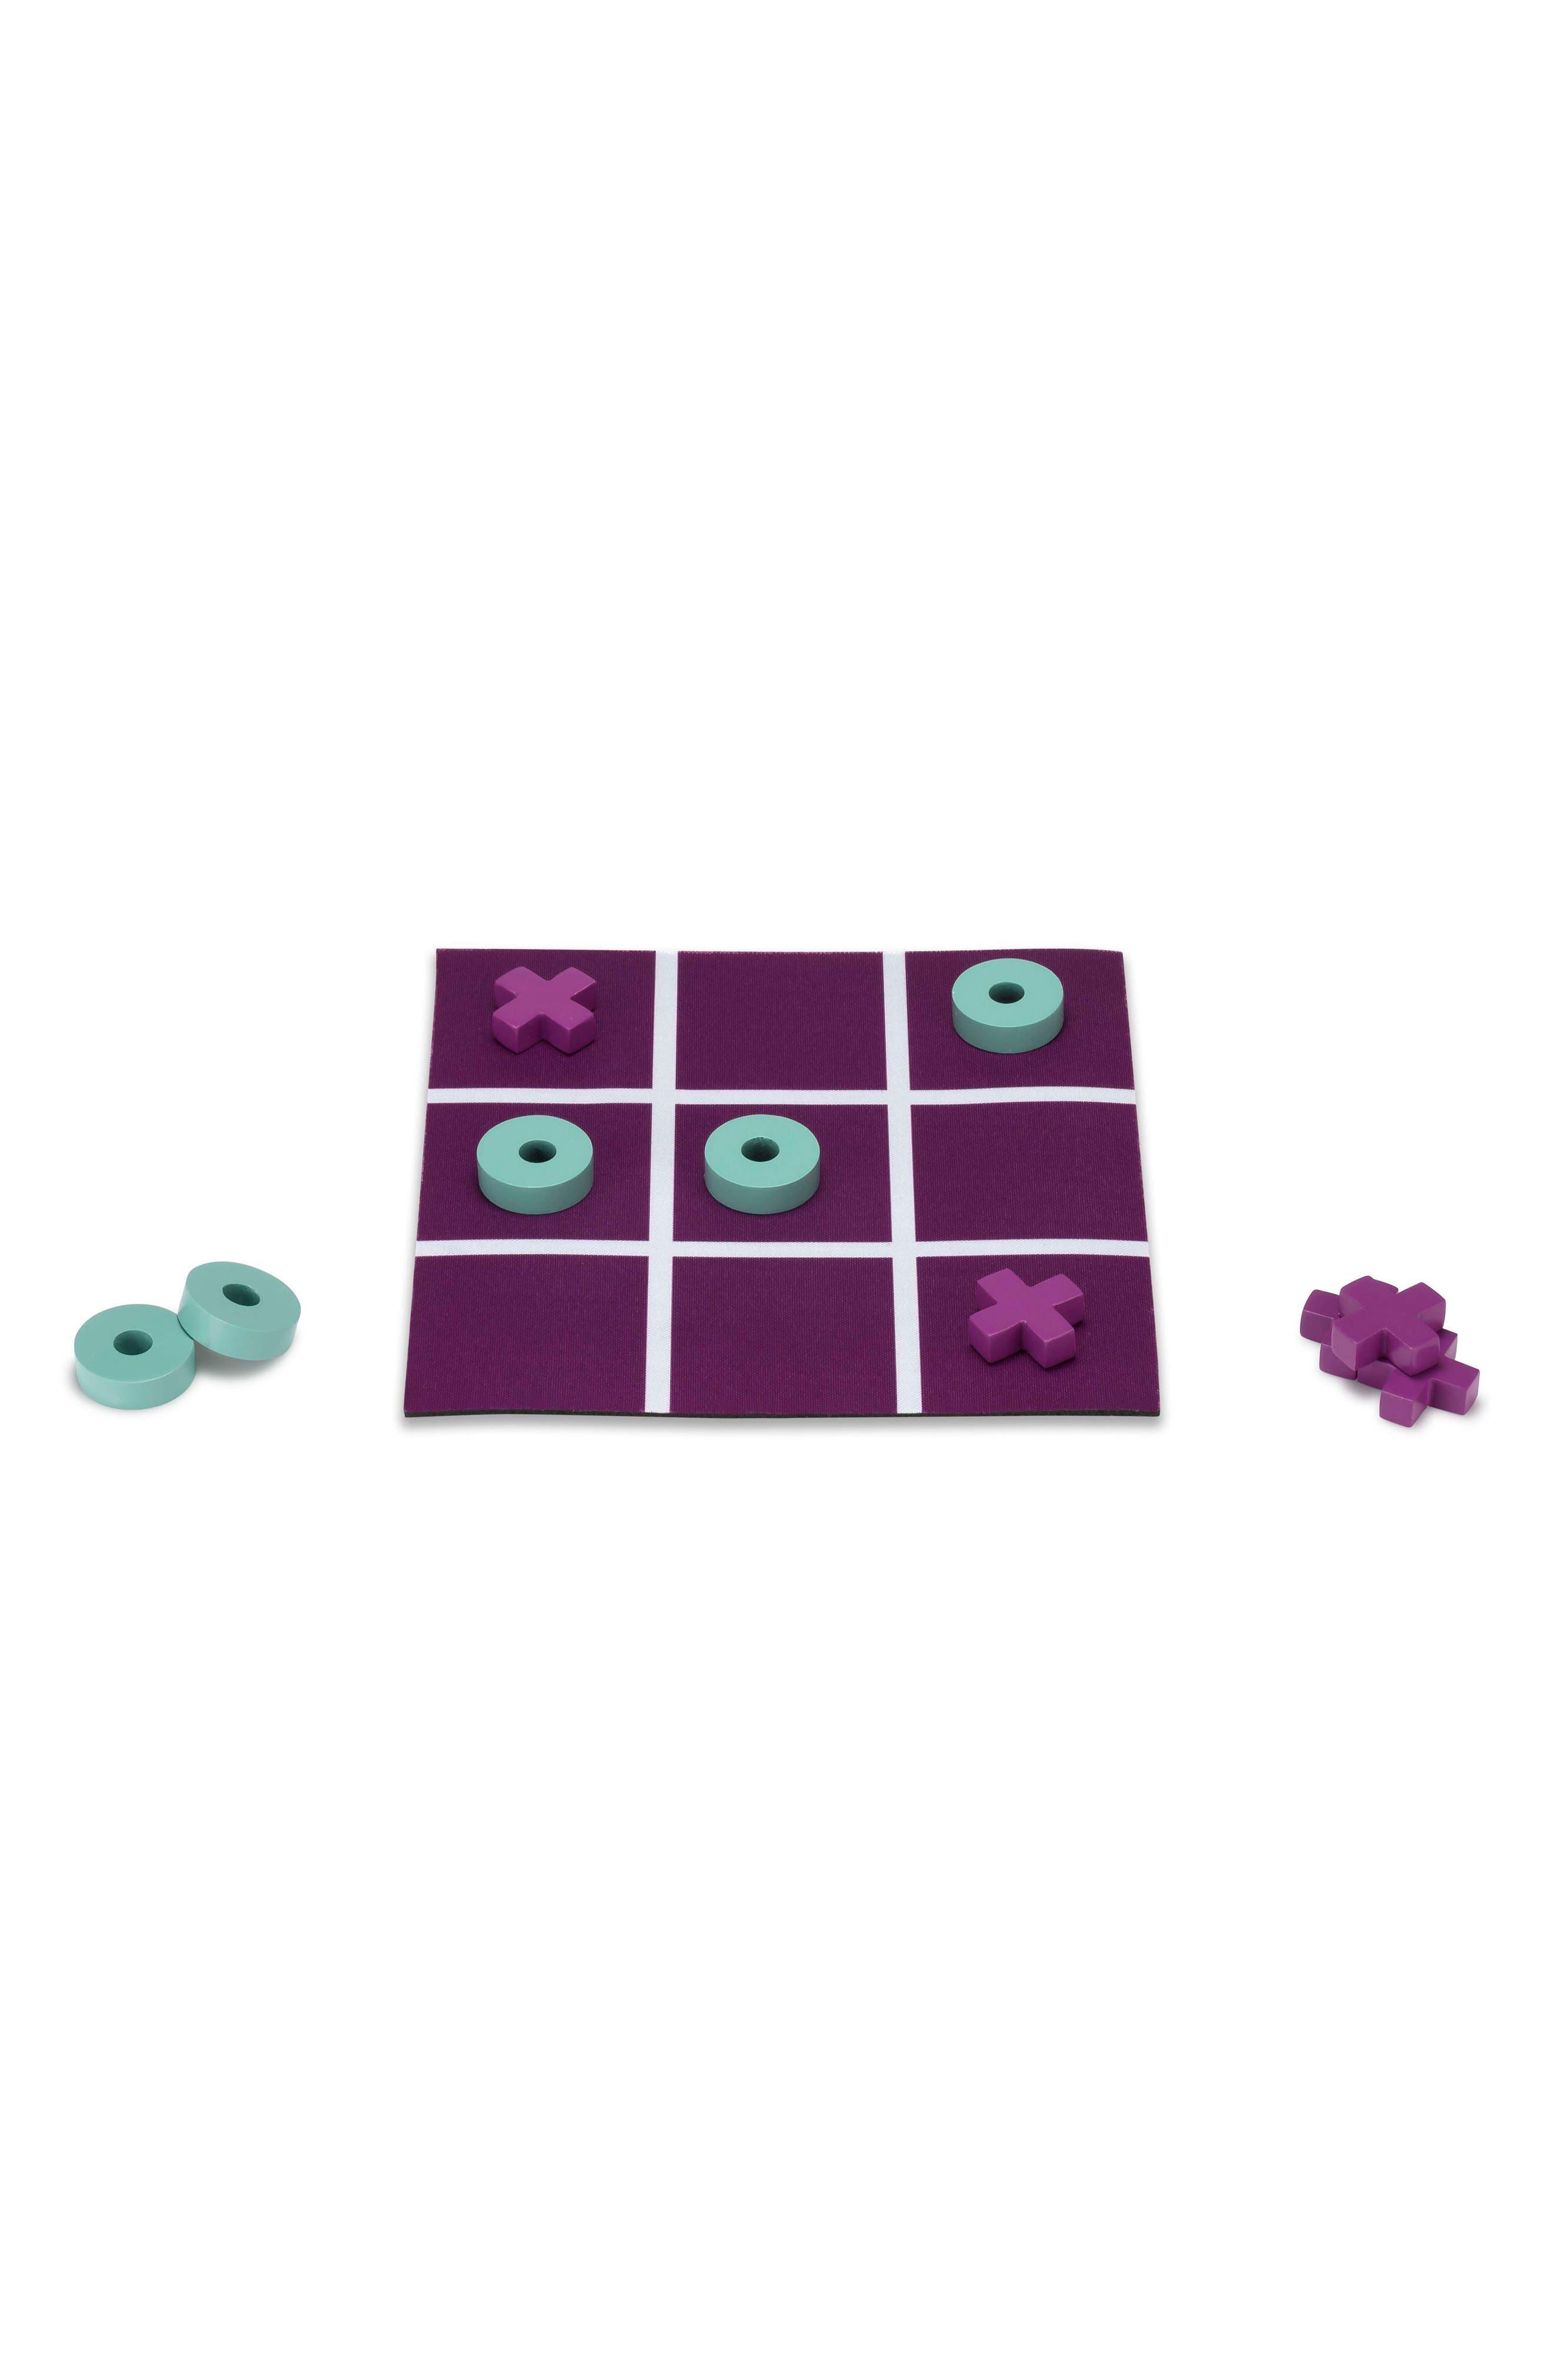 Desktop Games 11-Piece Pocket Tic-Tac-Toe Set,                             Alternate thumbnail 2, color,                             Multi